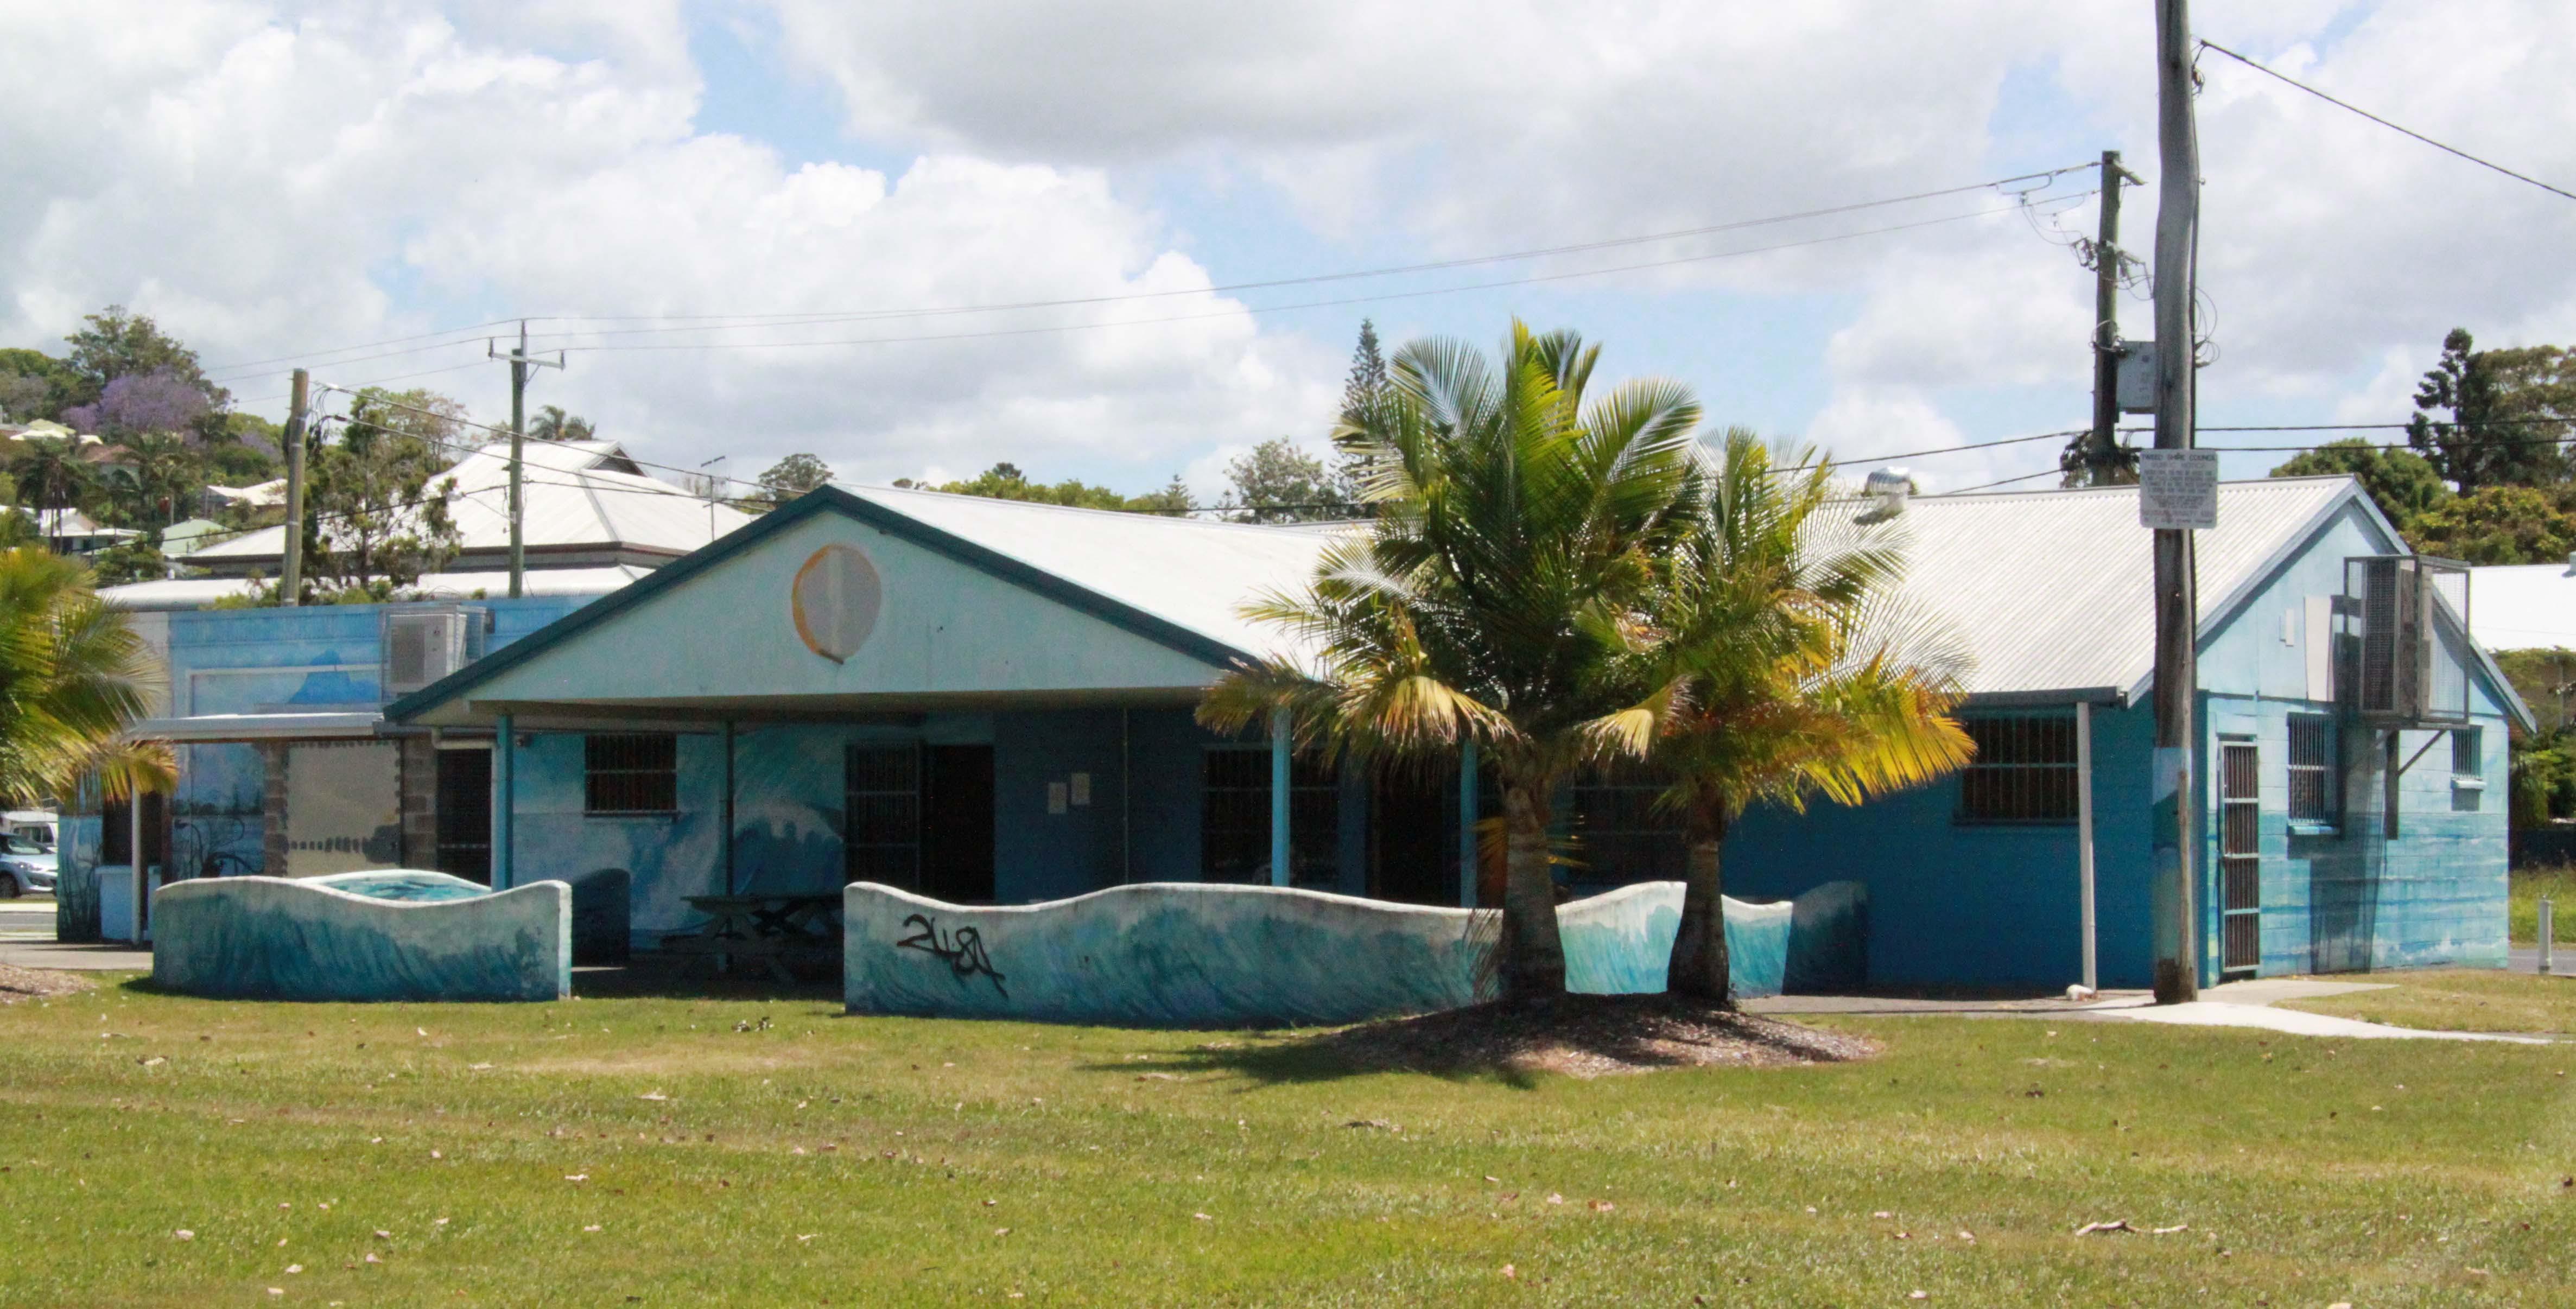 The former Murwillumbah Community Centre building.